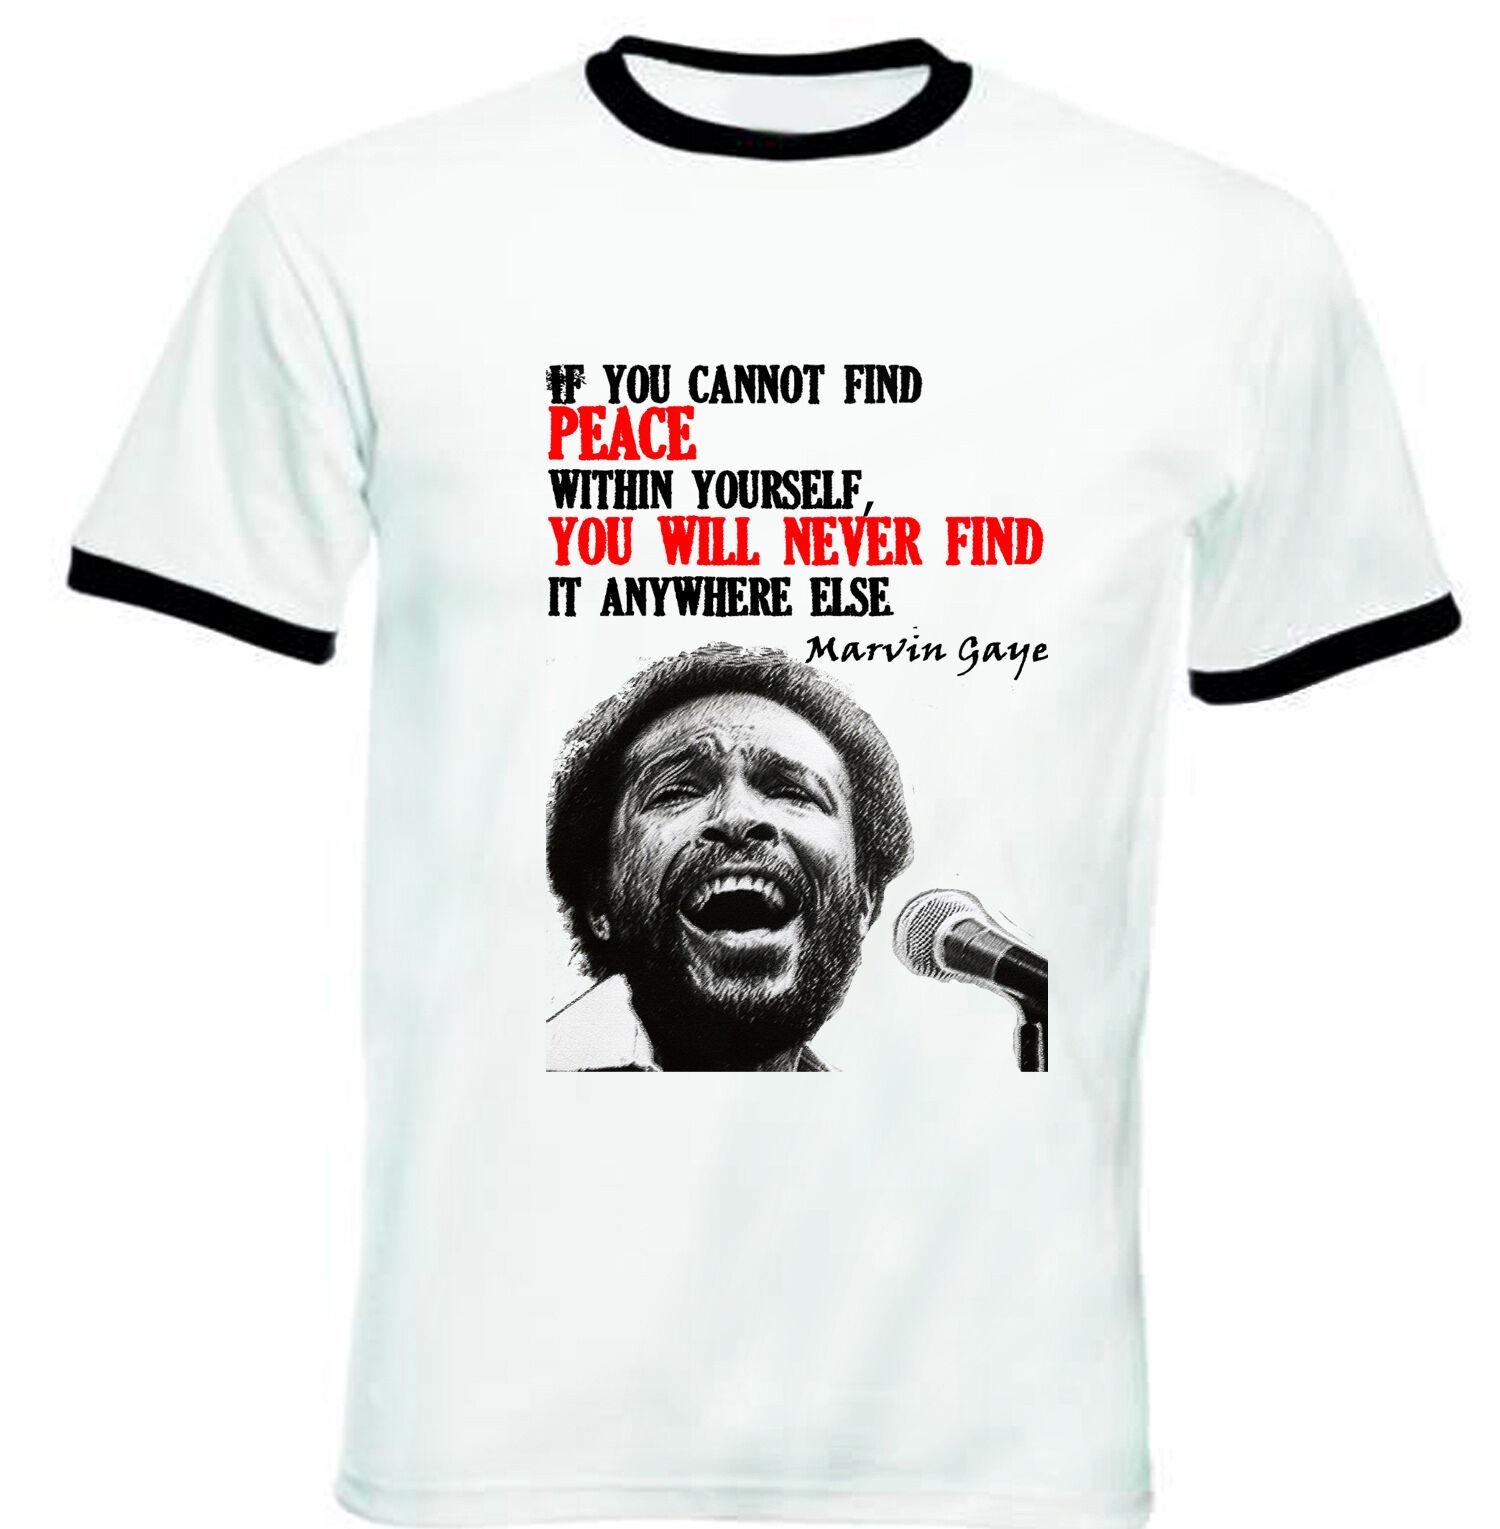 Mens Marvin Gaye Classic Comfortable Short-Sleeve Crewneck Cotton T-Shirt Black